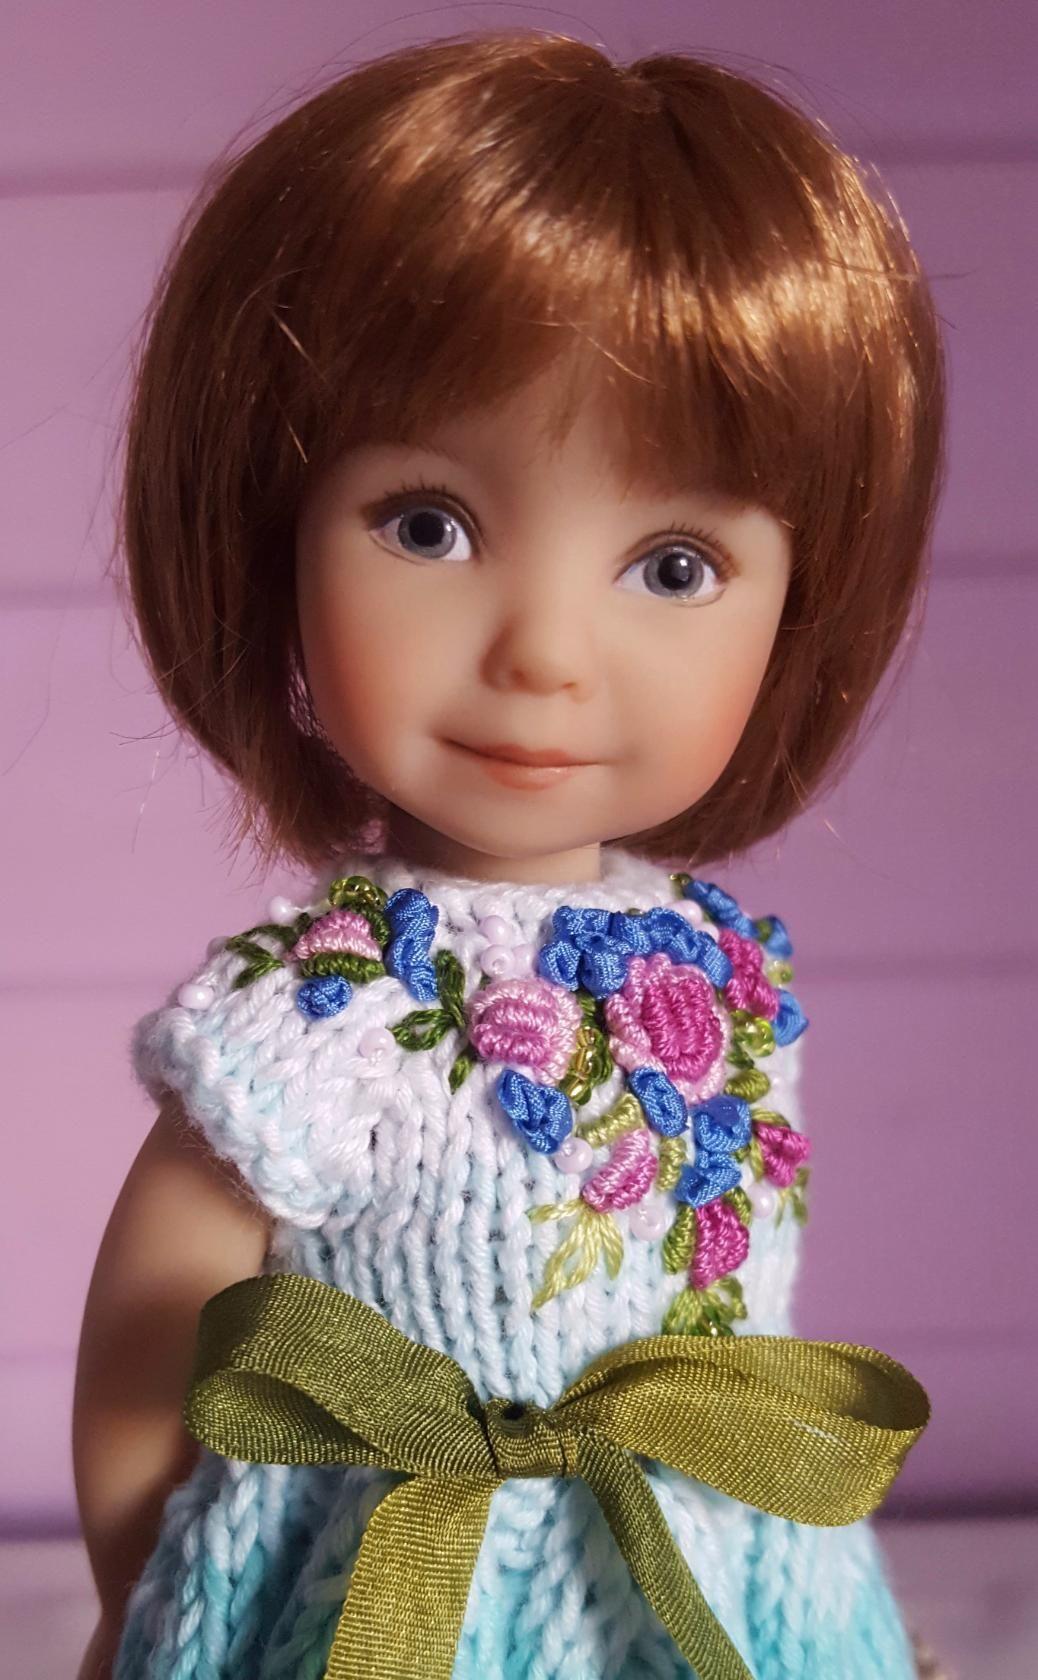 (99) Одноклассники | Винтажные куклы, Куклы, Одежда для кукол